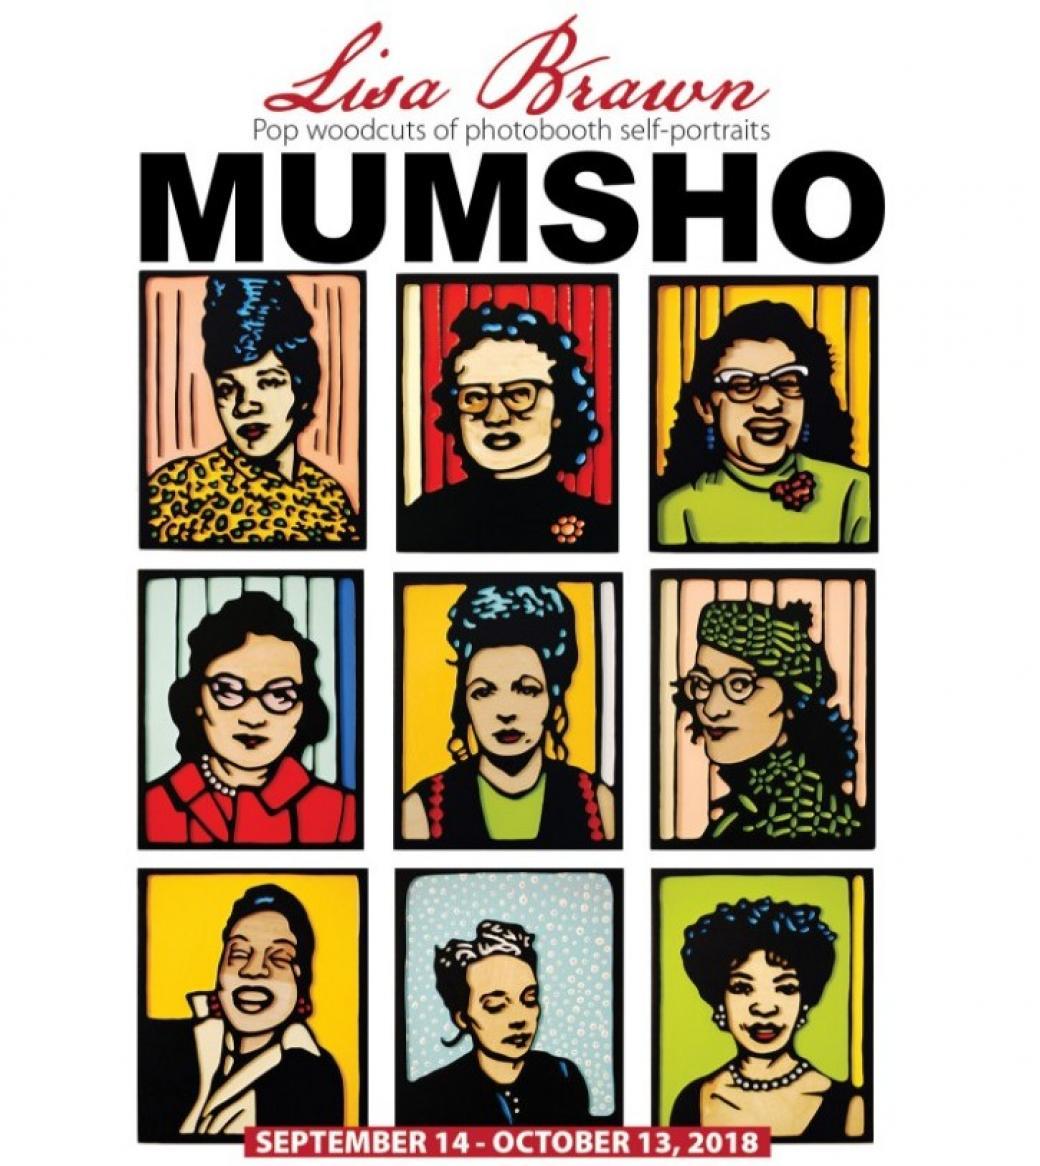 MUMSHO